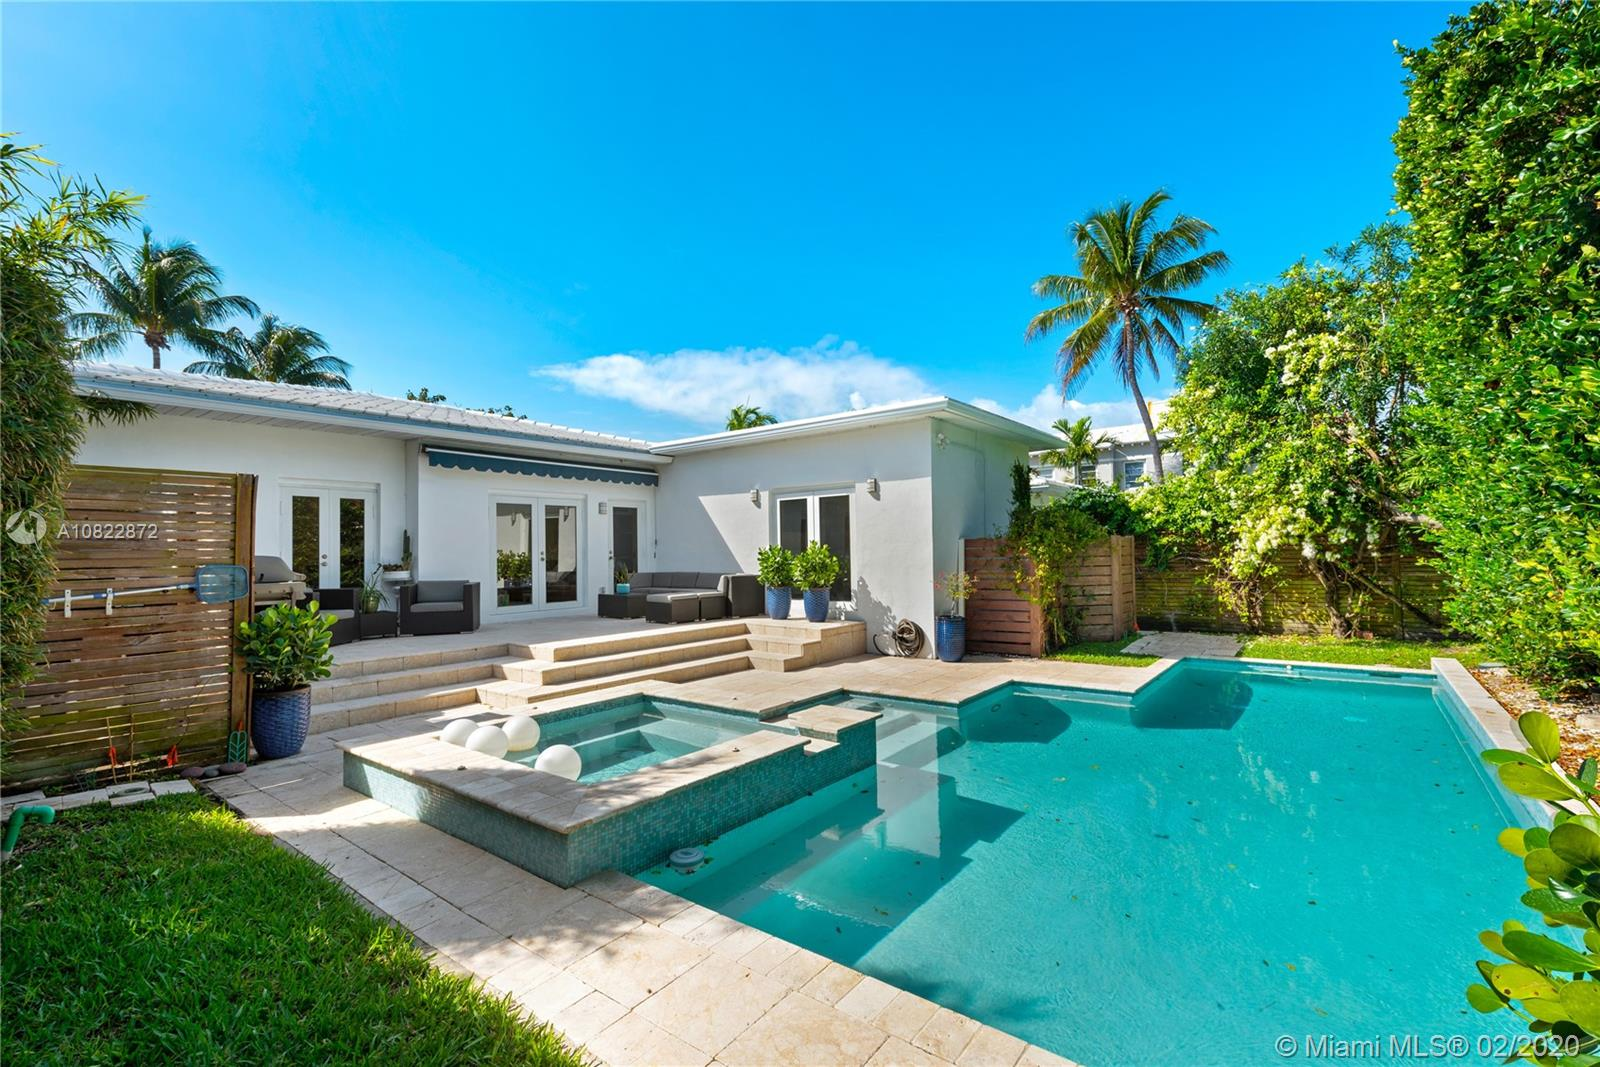 575 Lakeview Dr Miami Beach 33140